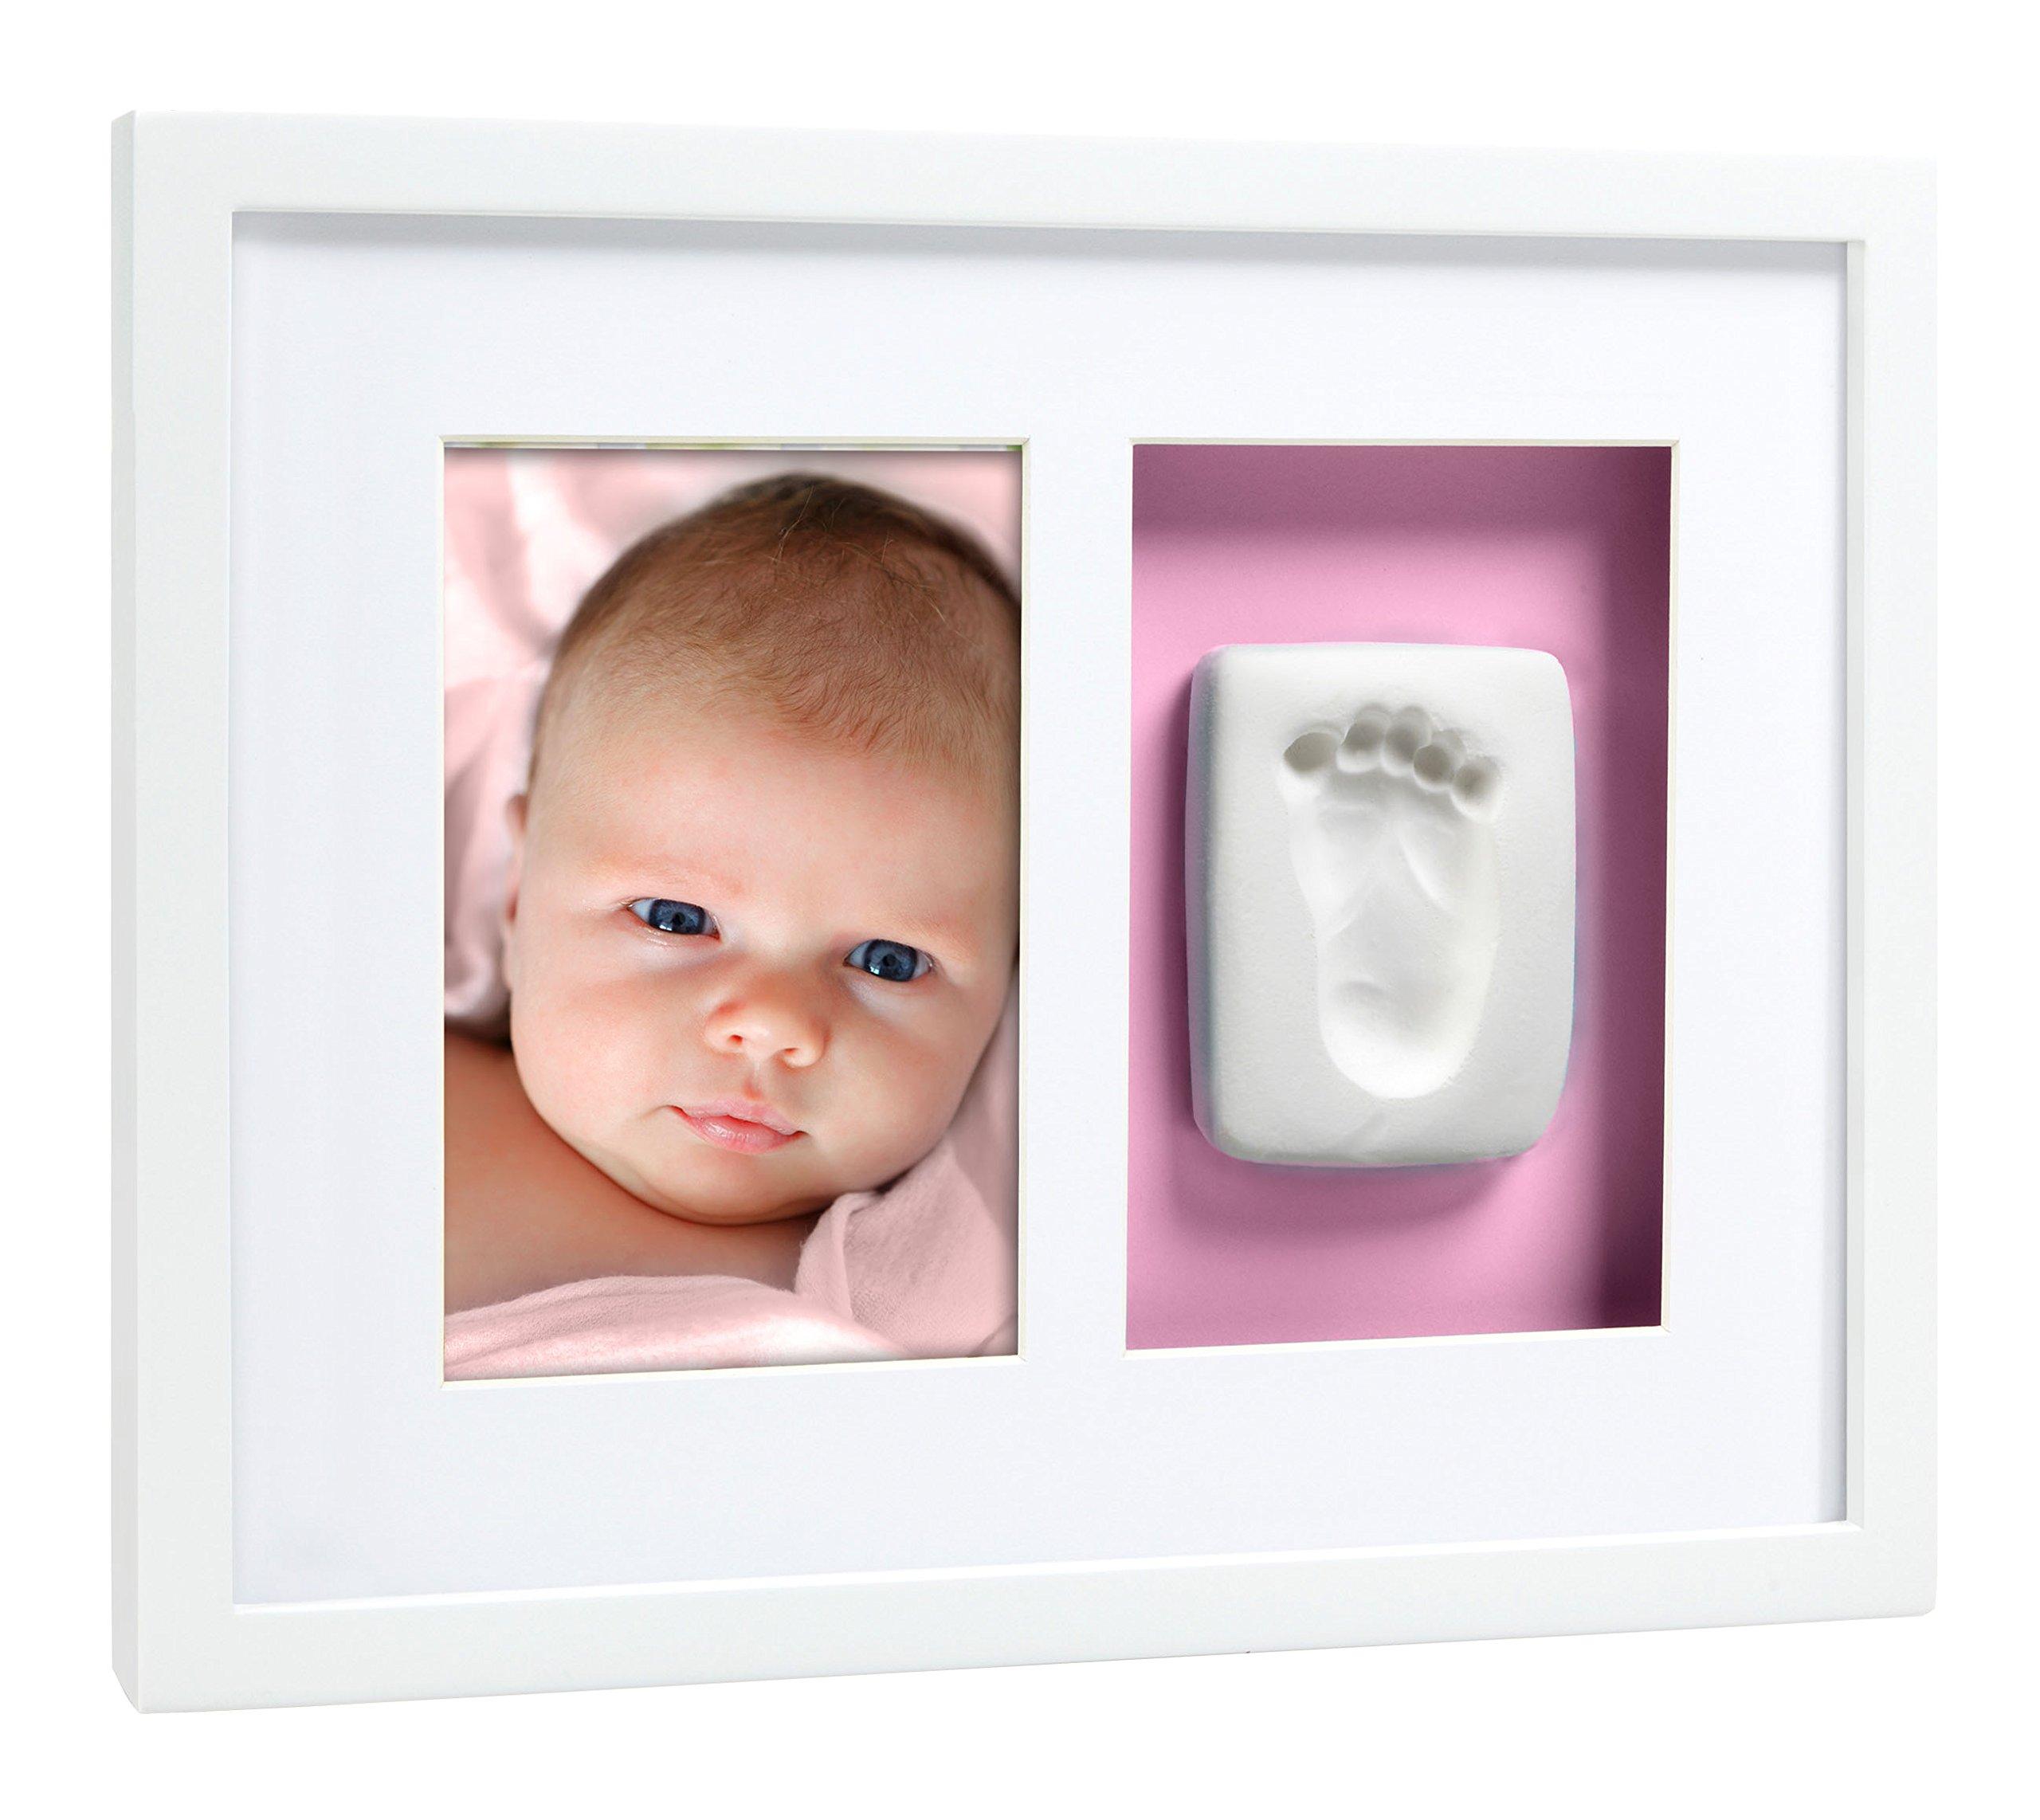 Pearhead Babyprints Baby Handprint or Footprint Wall Photo Frame & Impression Kit, White